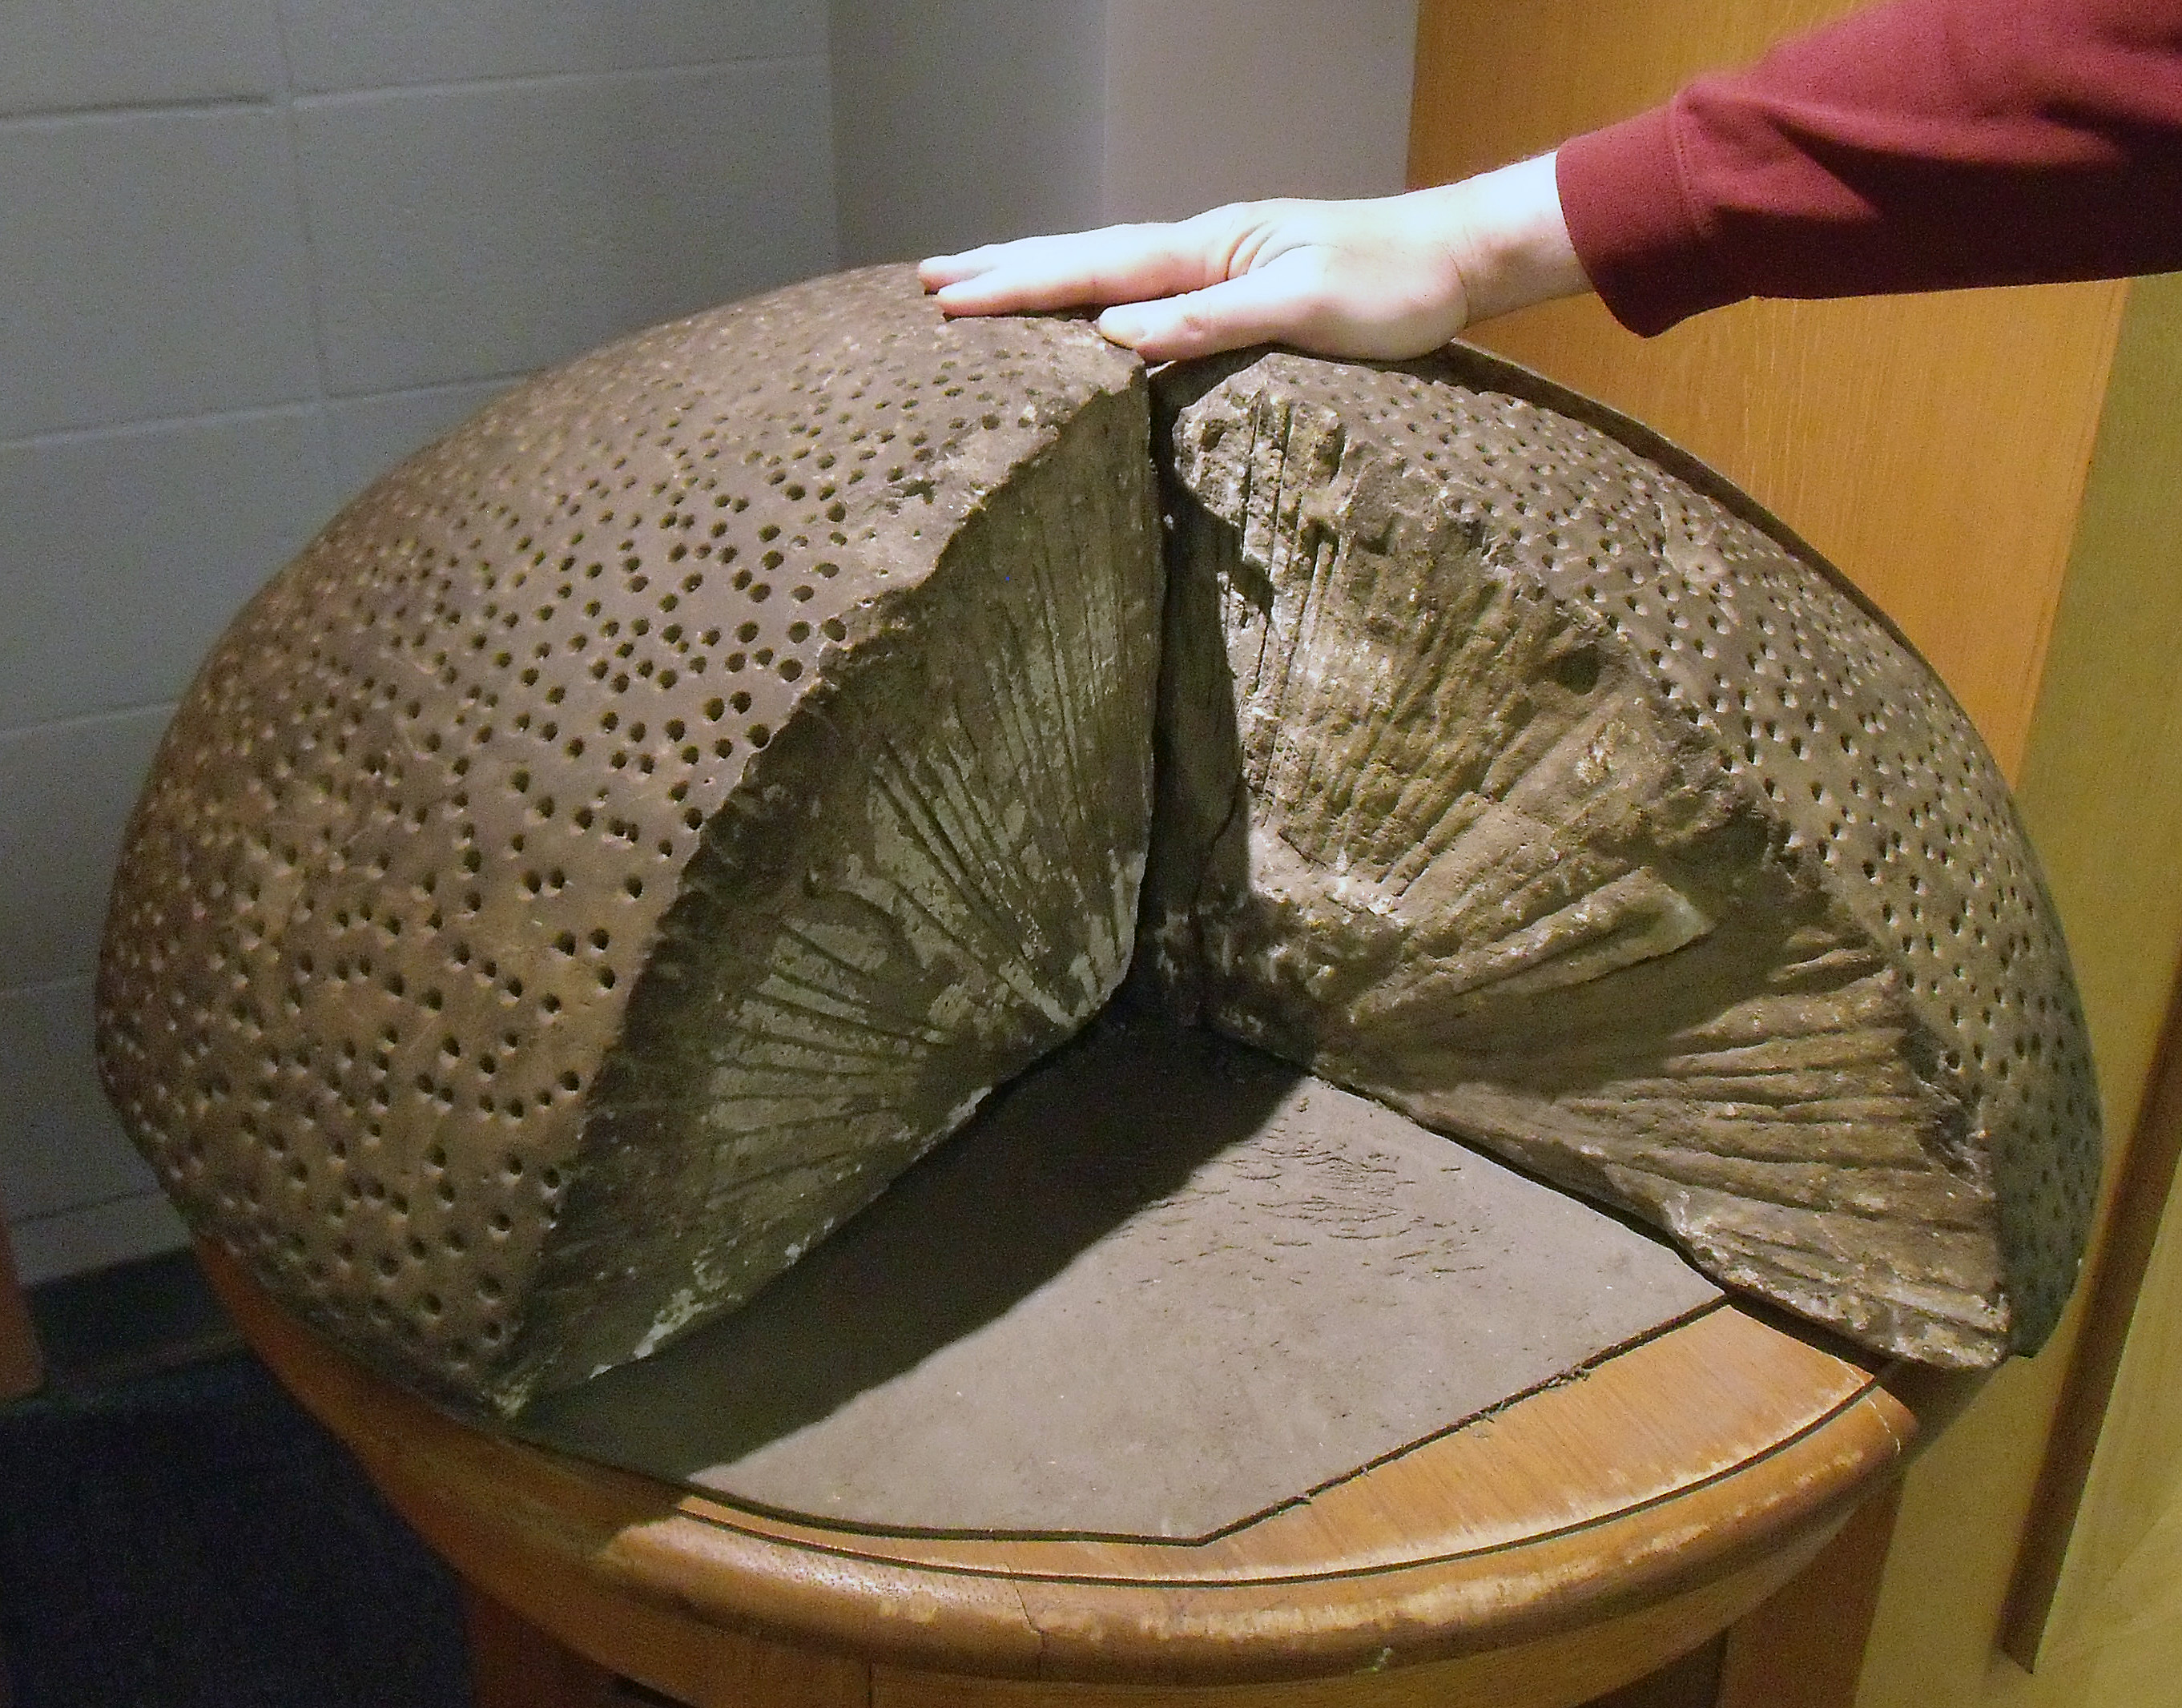 File:A pitted half-dome of a rock, U of A -b.jpg ...